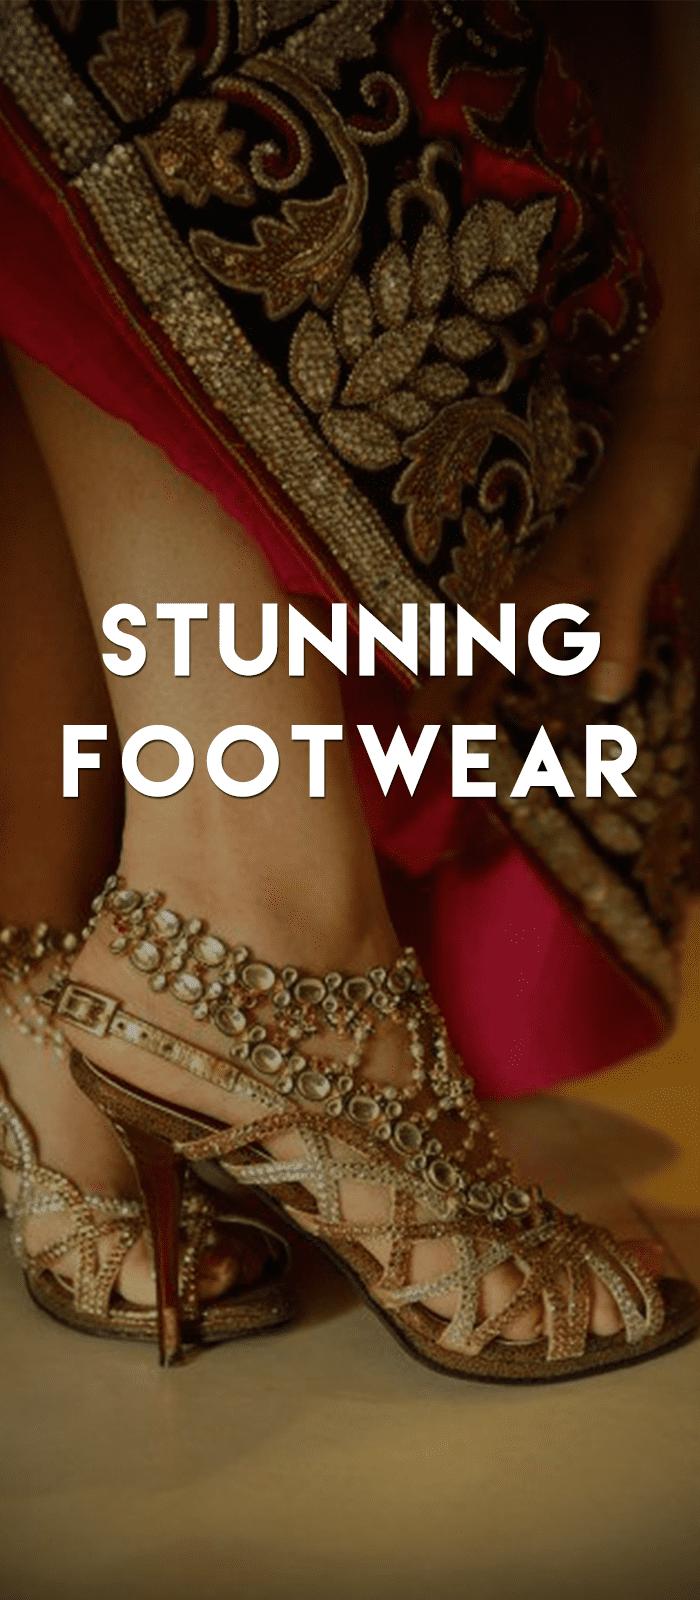 Stunning Footwear